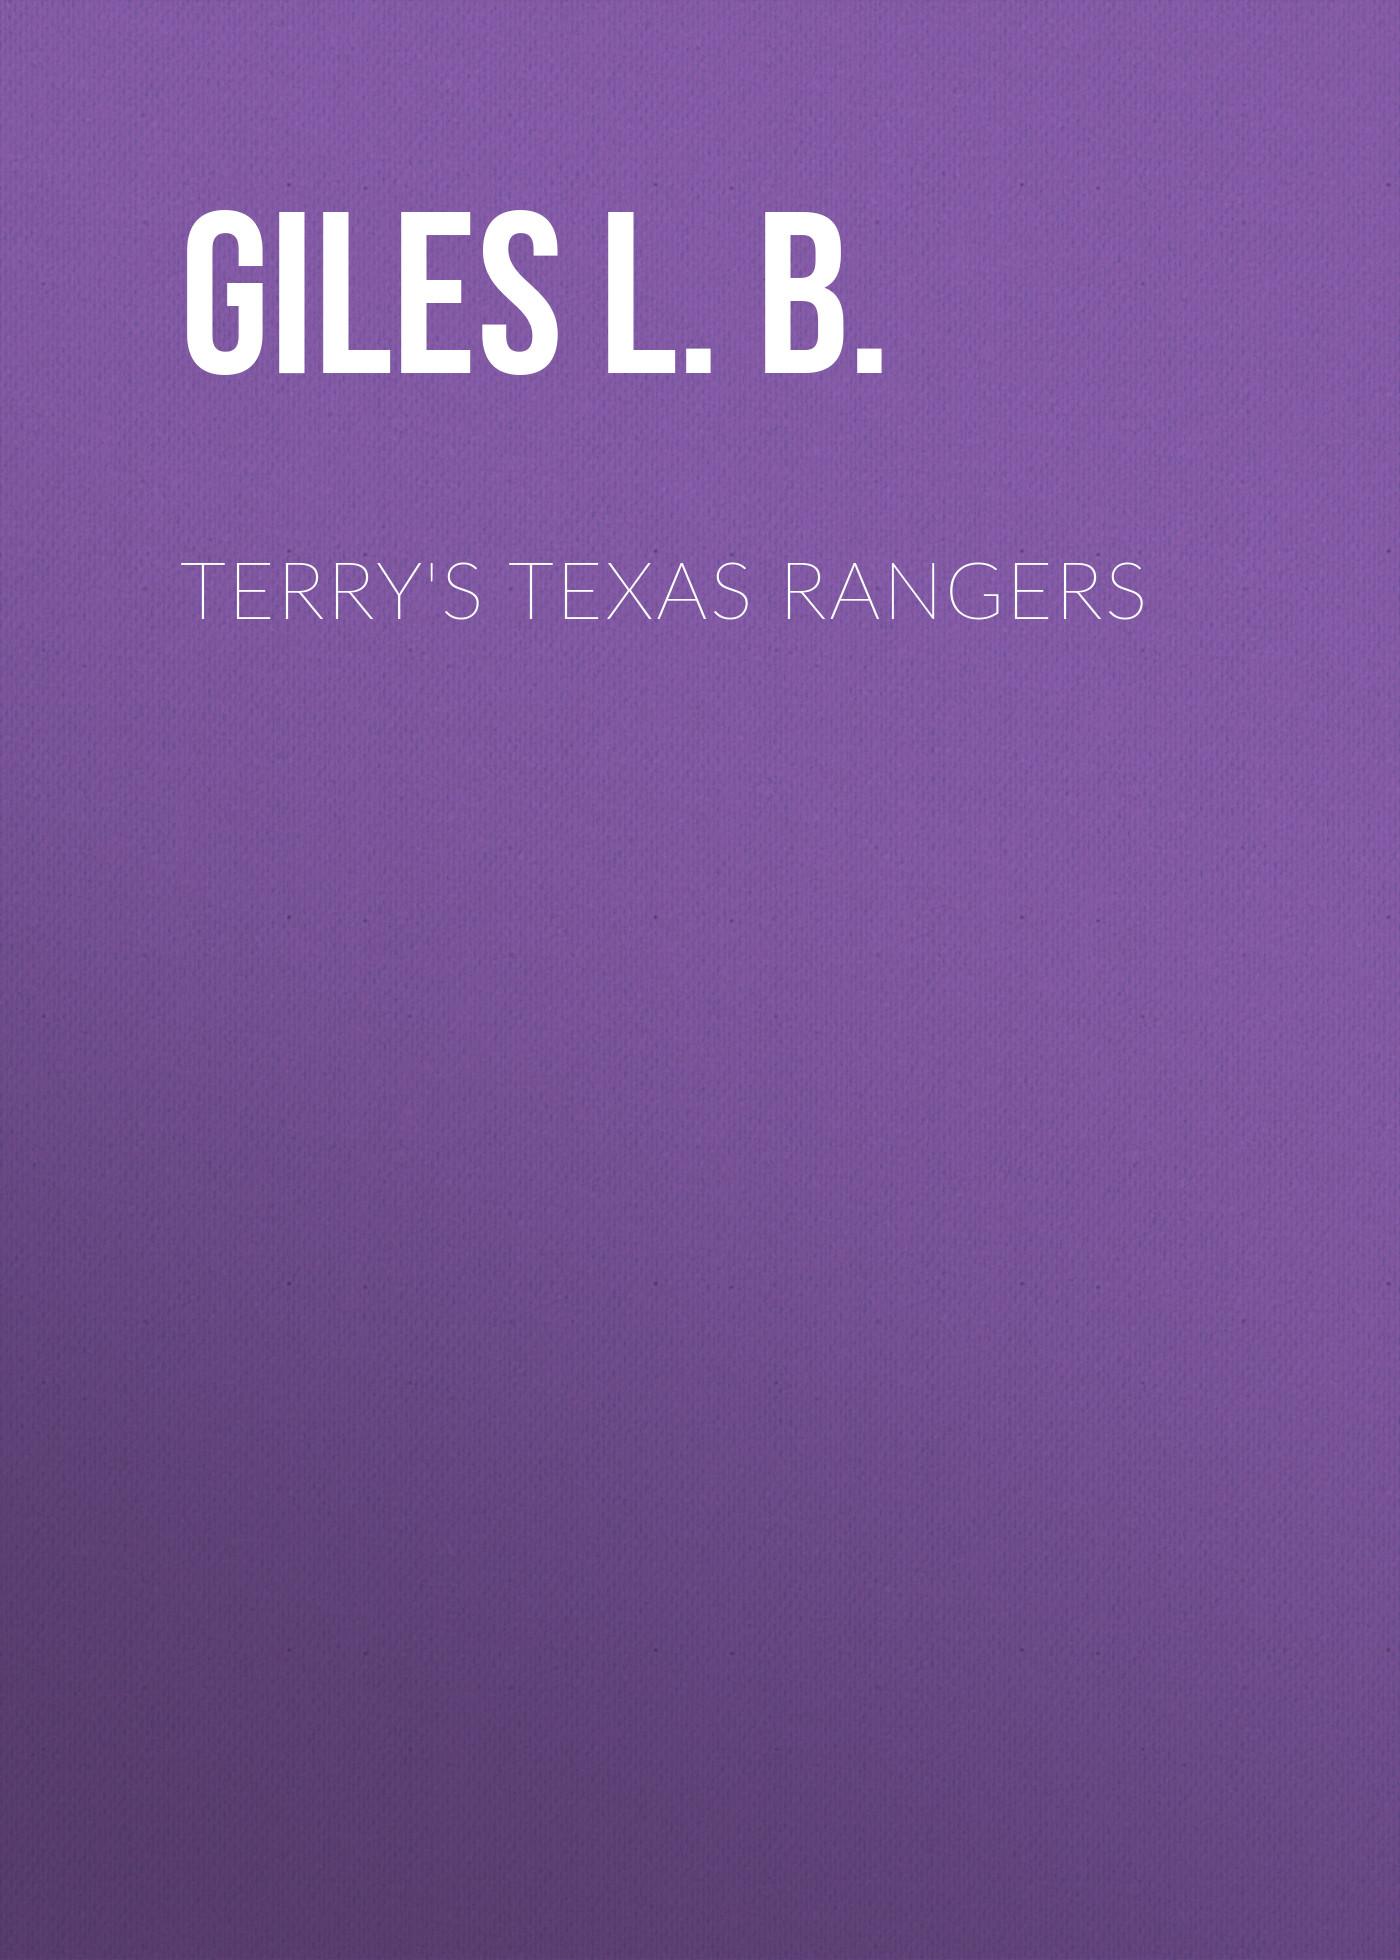 Giles L. B. Terry's Texas Rangers недорого